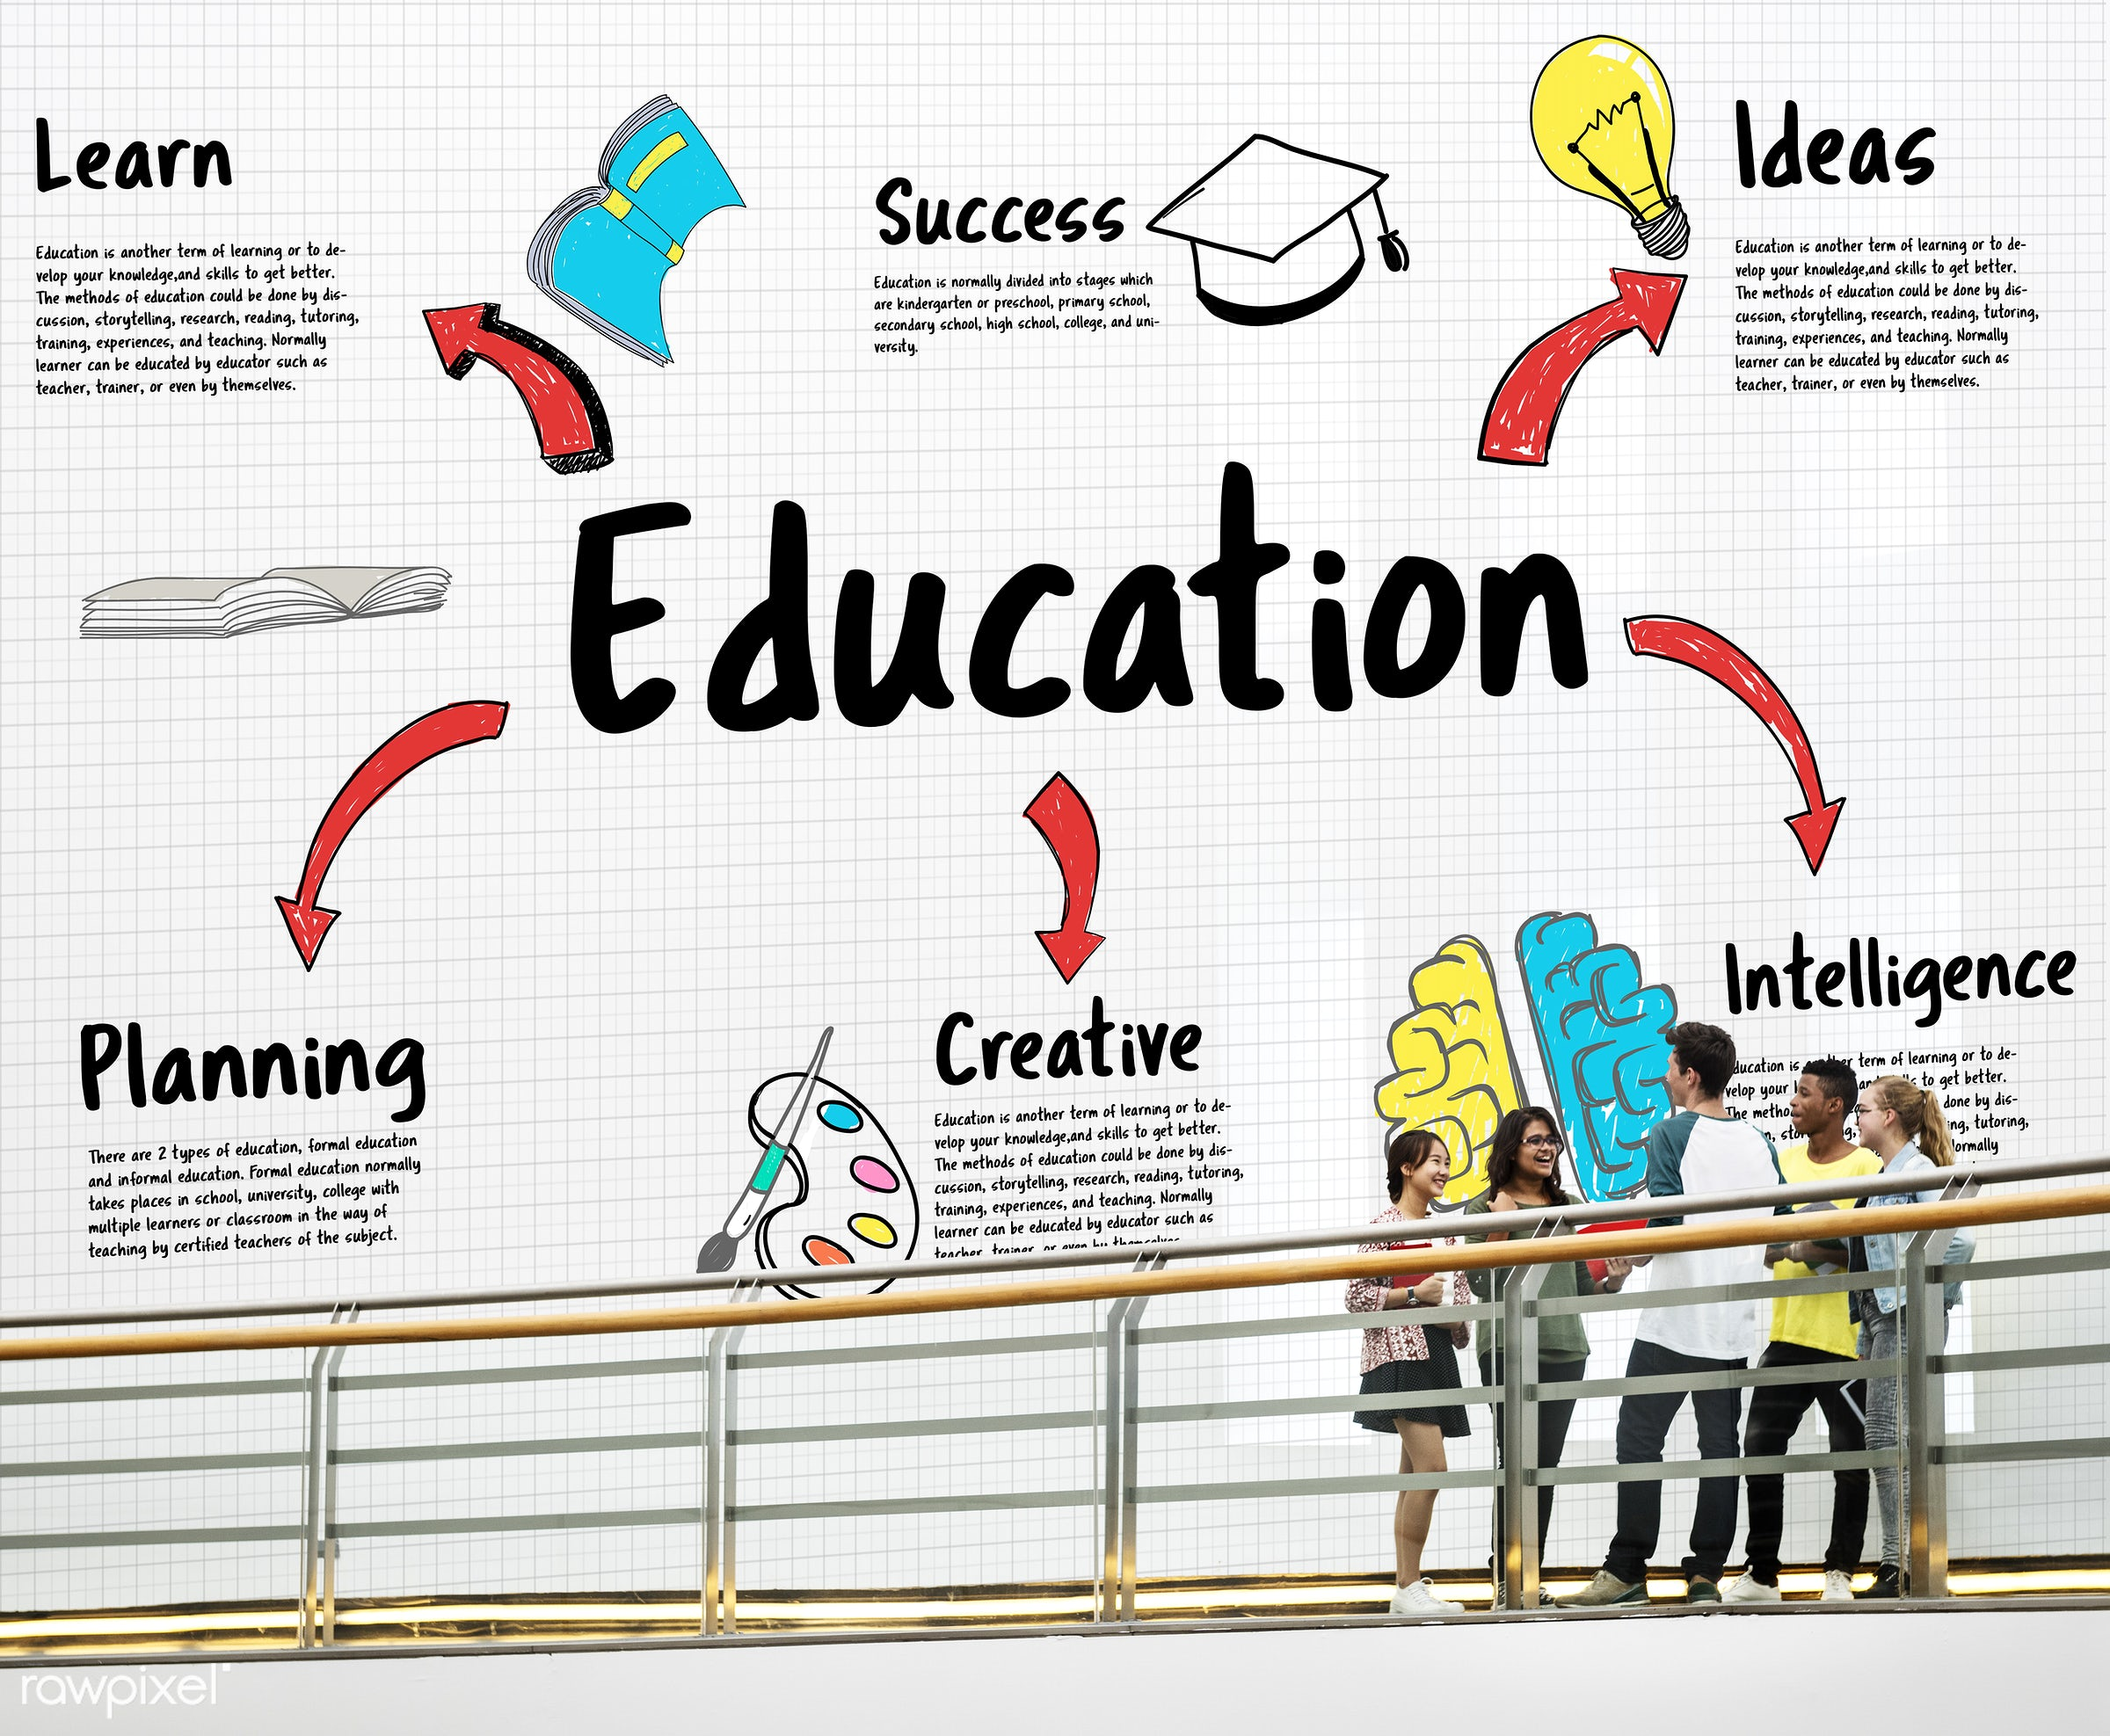 academic, book, books, boy, brain, bridge, bulb, carrying, creativity, friends, friendship, girls, graphic, group of people...